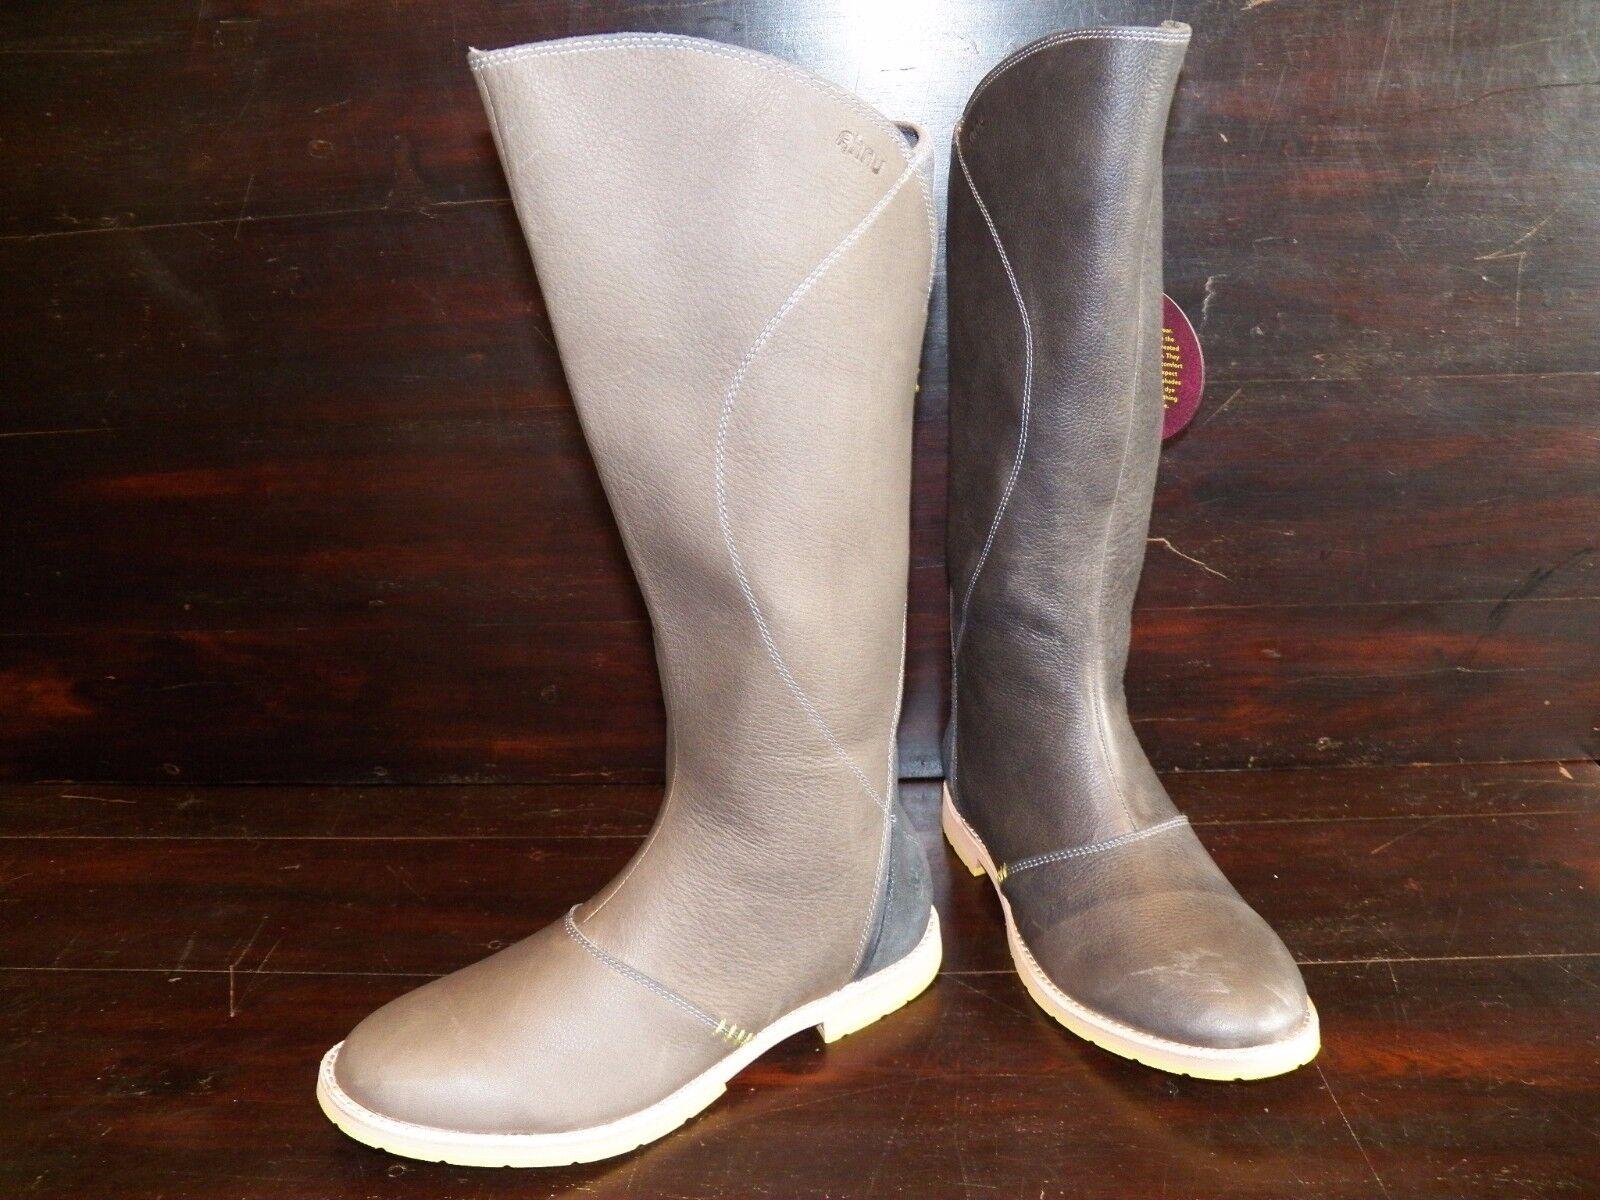 New Damenschuhe Ahnu Equestrian Helena Pewter Leder Suede Tall Riding Equestrian Ahnu Knee Stiefel 3fdf06